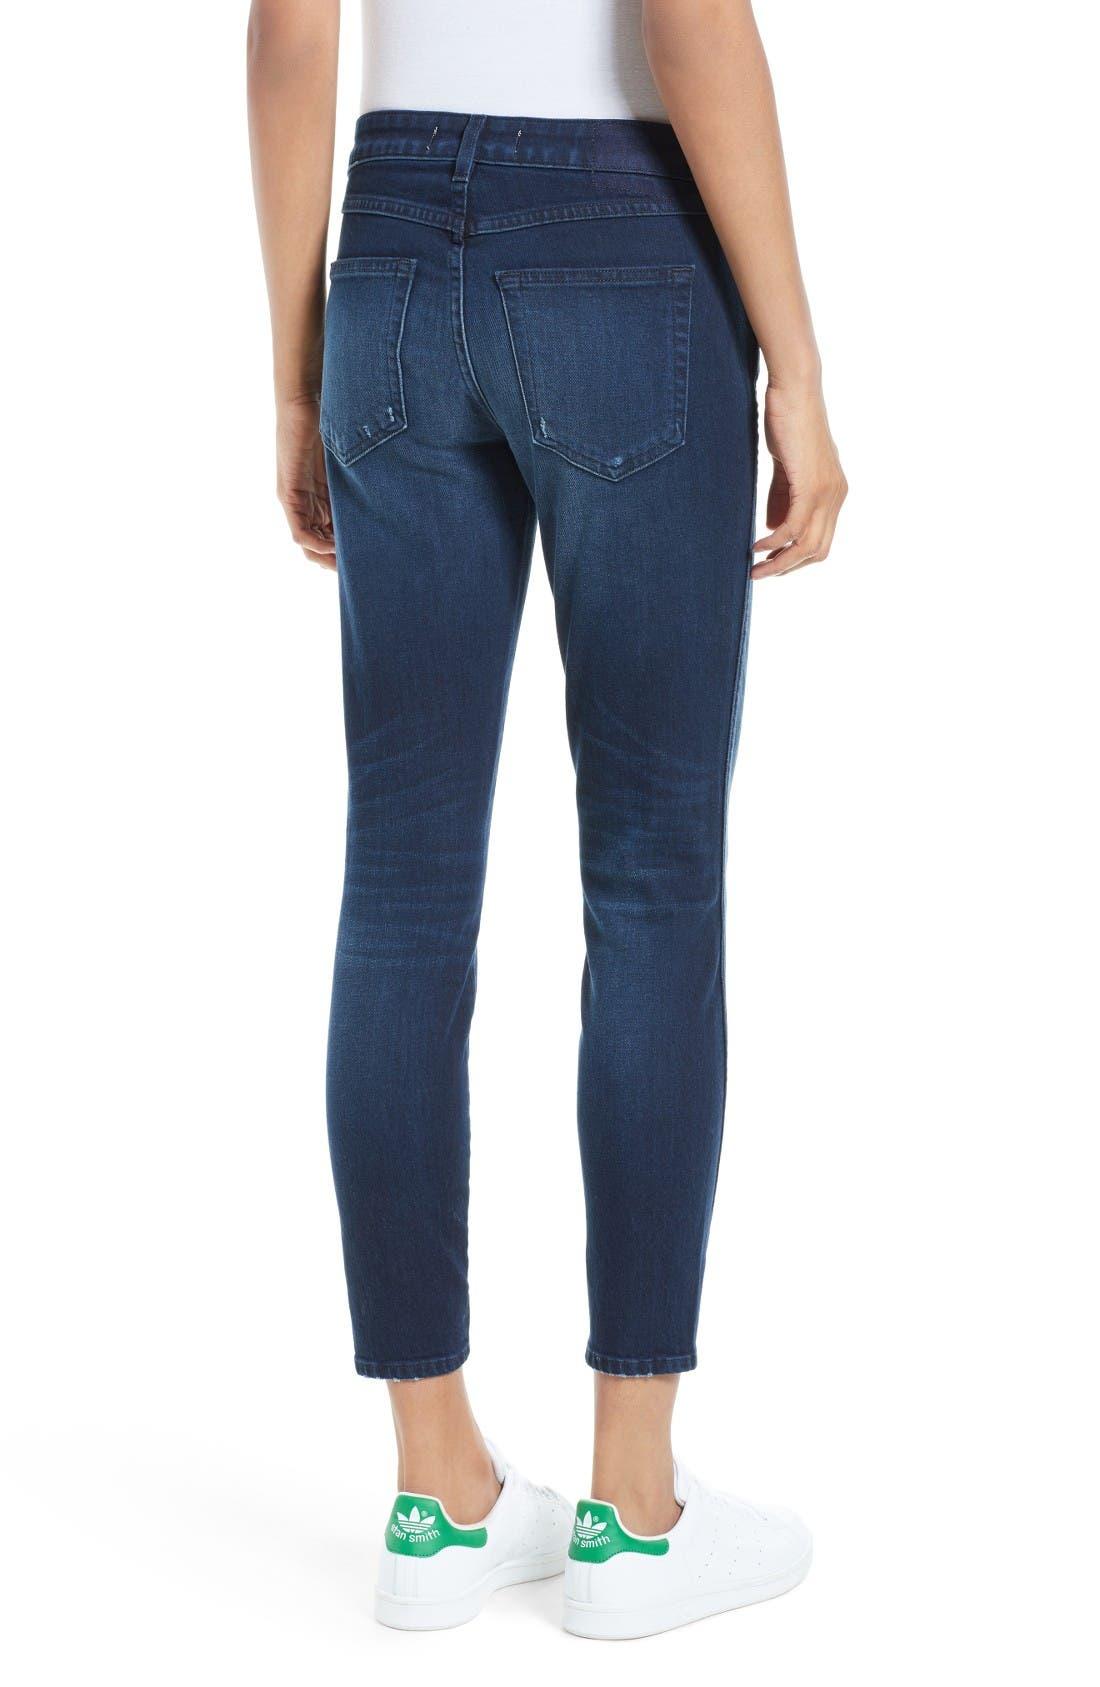 Alternate Image 2  - AMO 'Twist' Crop Skinny Jeans (Eclipse)